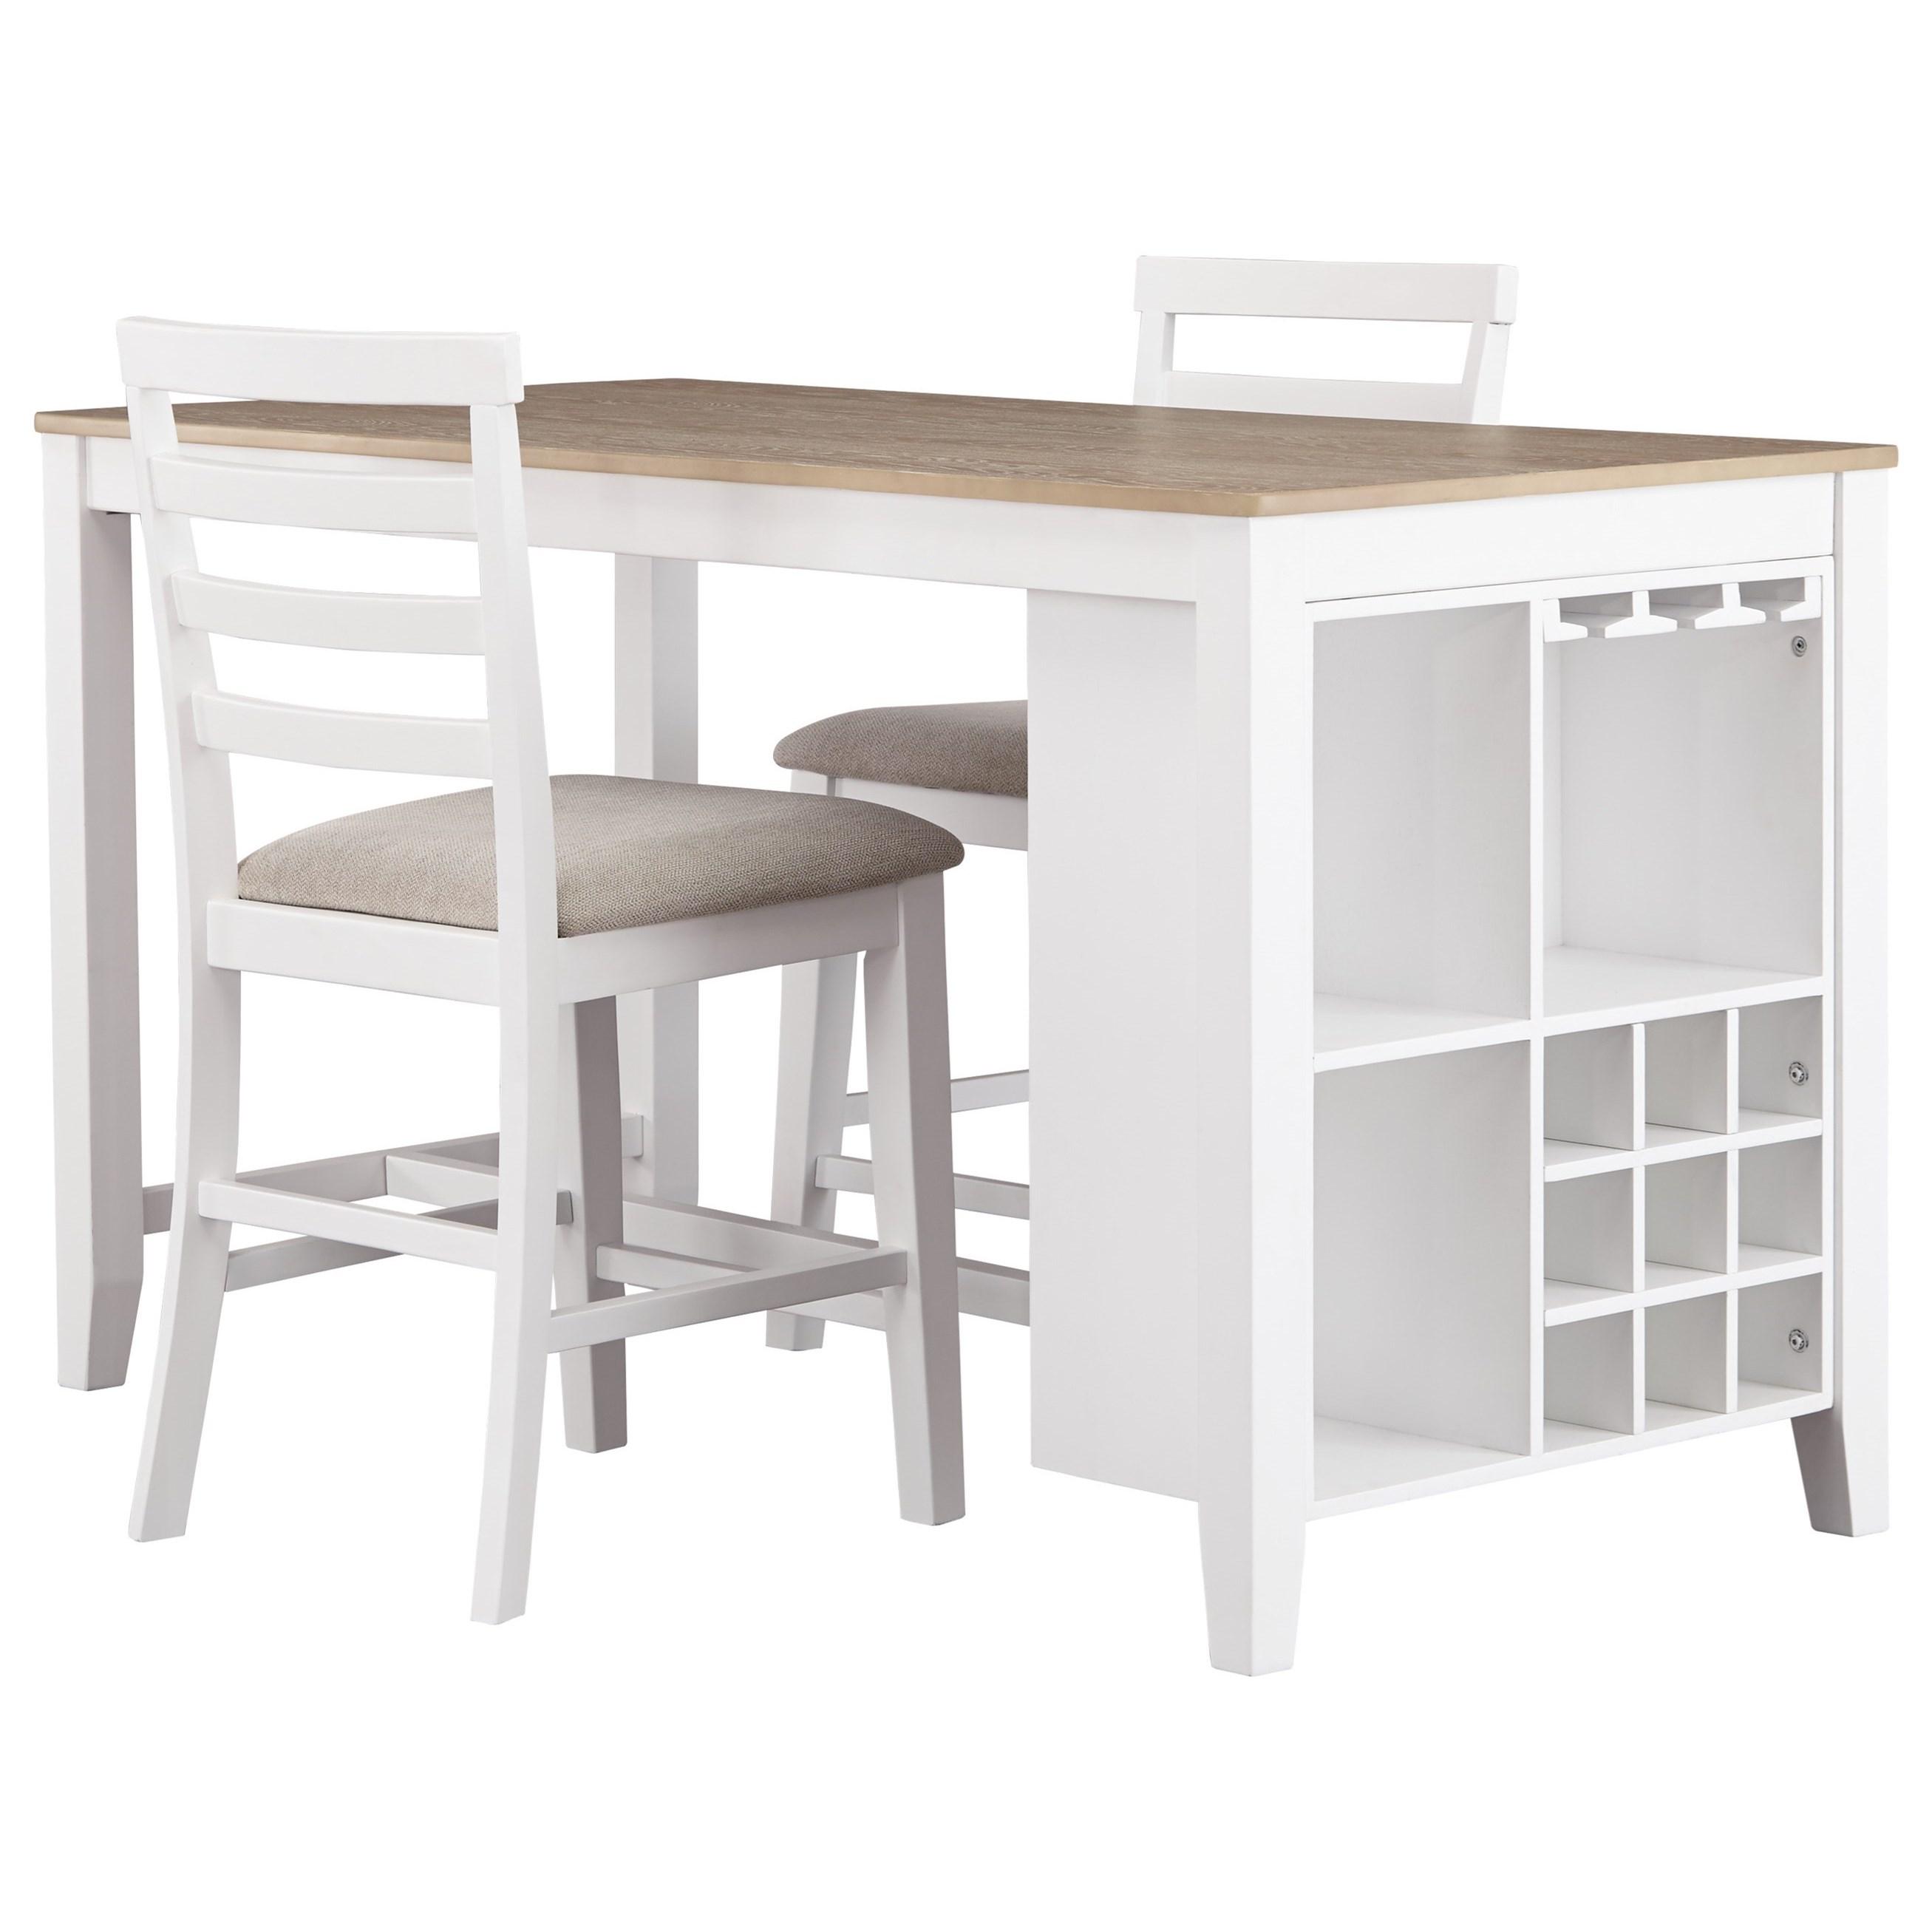 Signature Design by Ashley Gardomi 3-Piece Counter Table Set - Item Number: D632-32+2x124